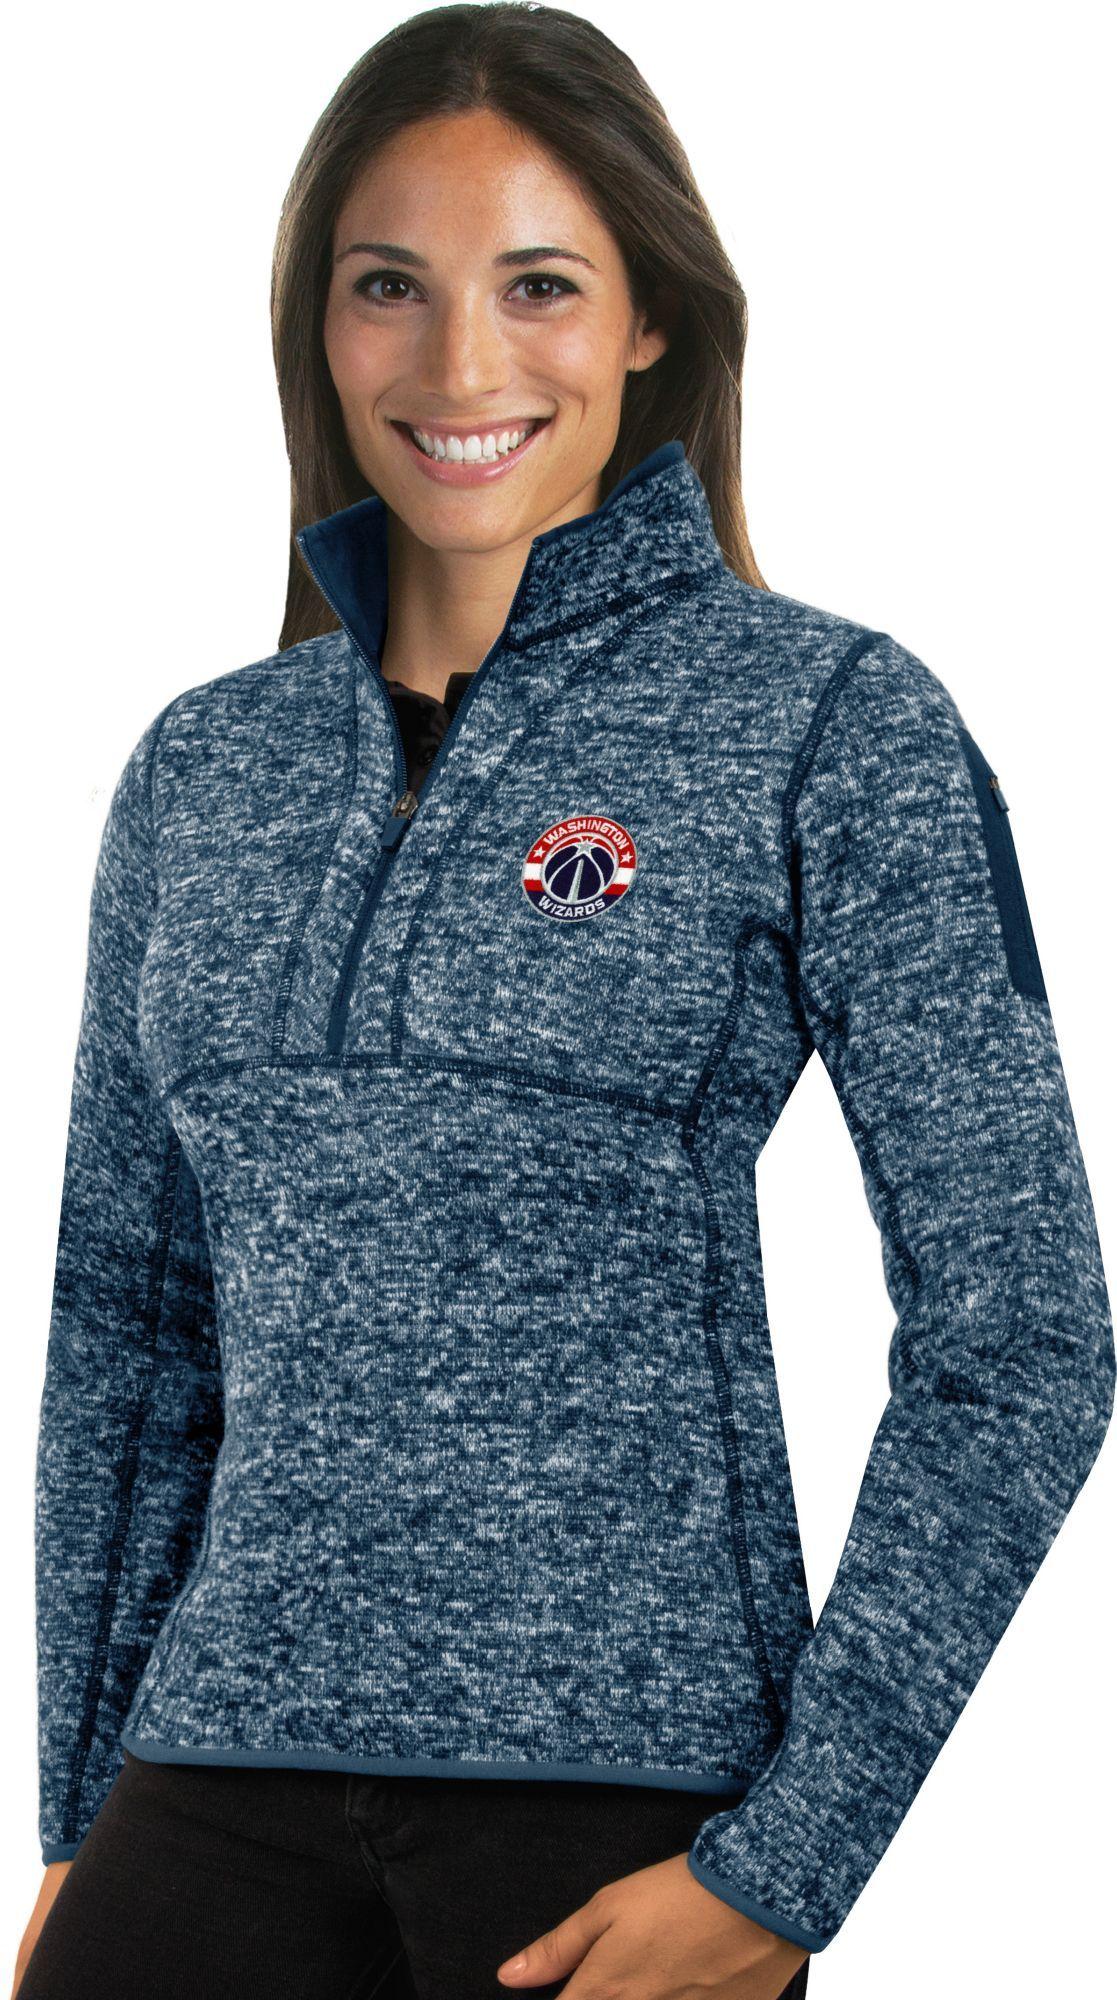 52a5fd8e Antigua Women's Washington Wizards Fortune Navy Half-Zip Pullover, Size:  Medium, Team